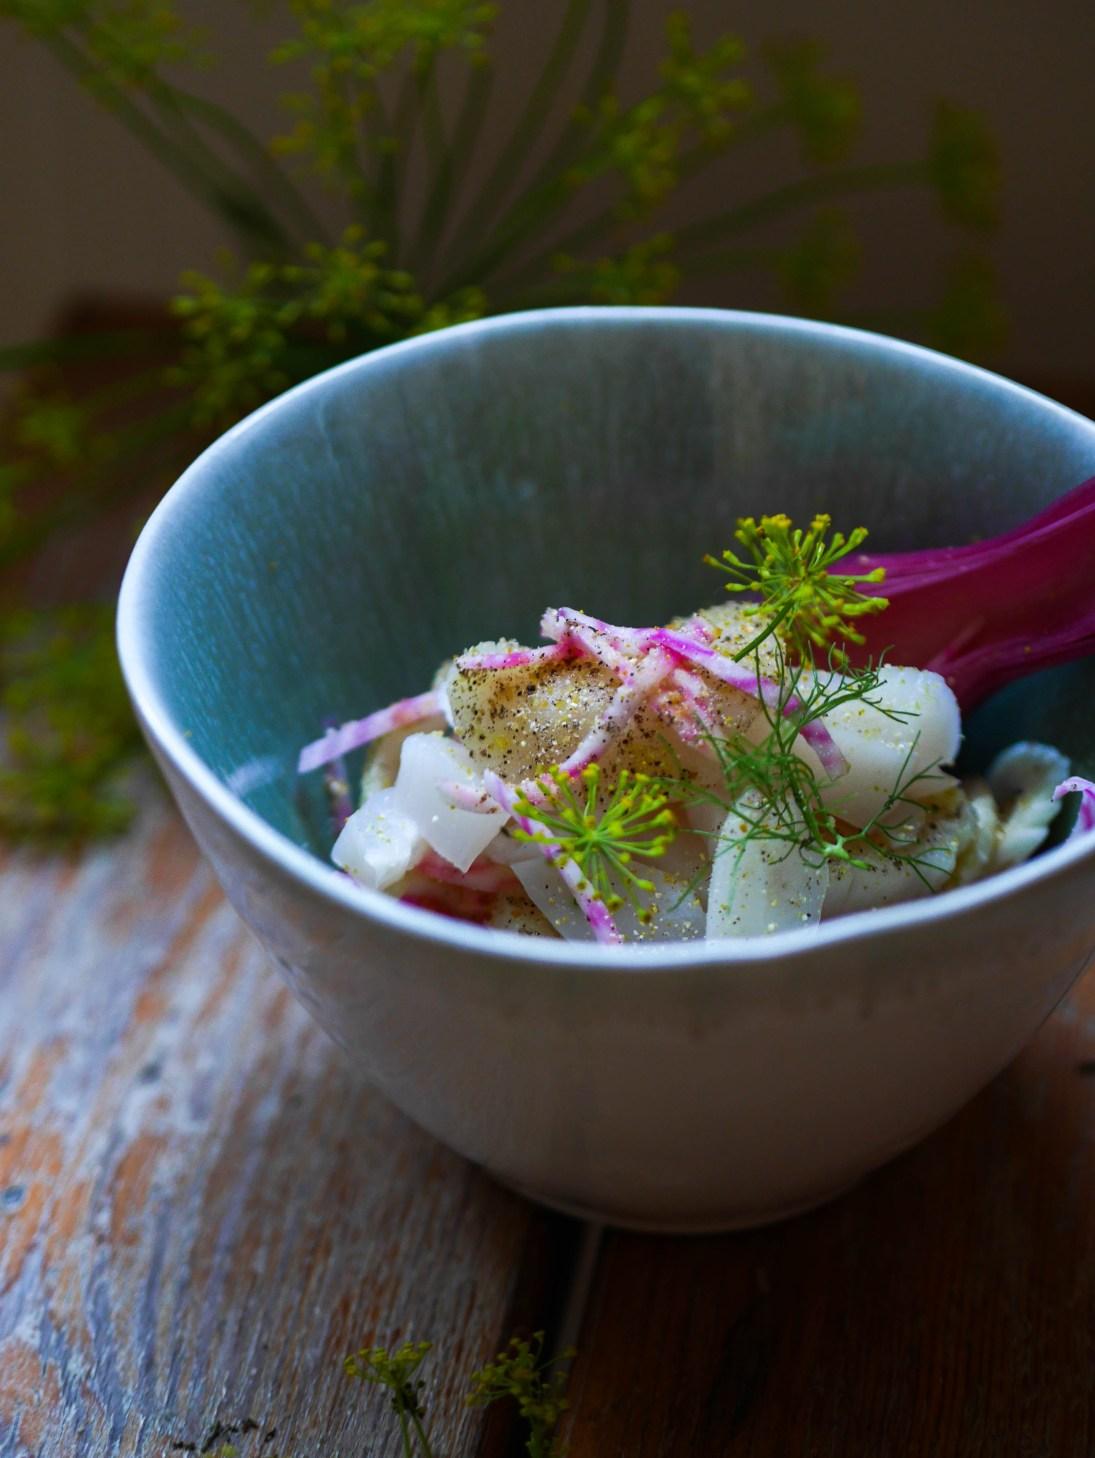 food-blog-culinaire-woodmoodfood-recette-facile-ceviche-saint-jacques-fleurs-aneth-1